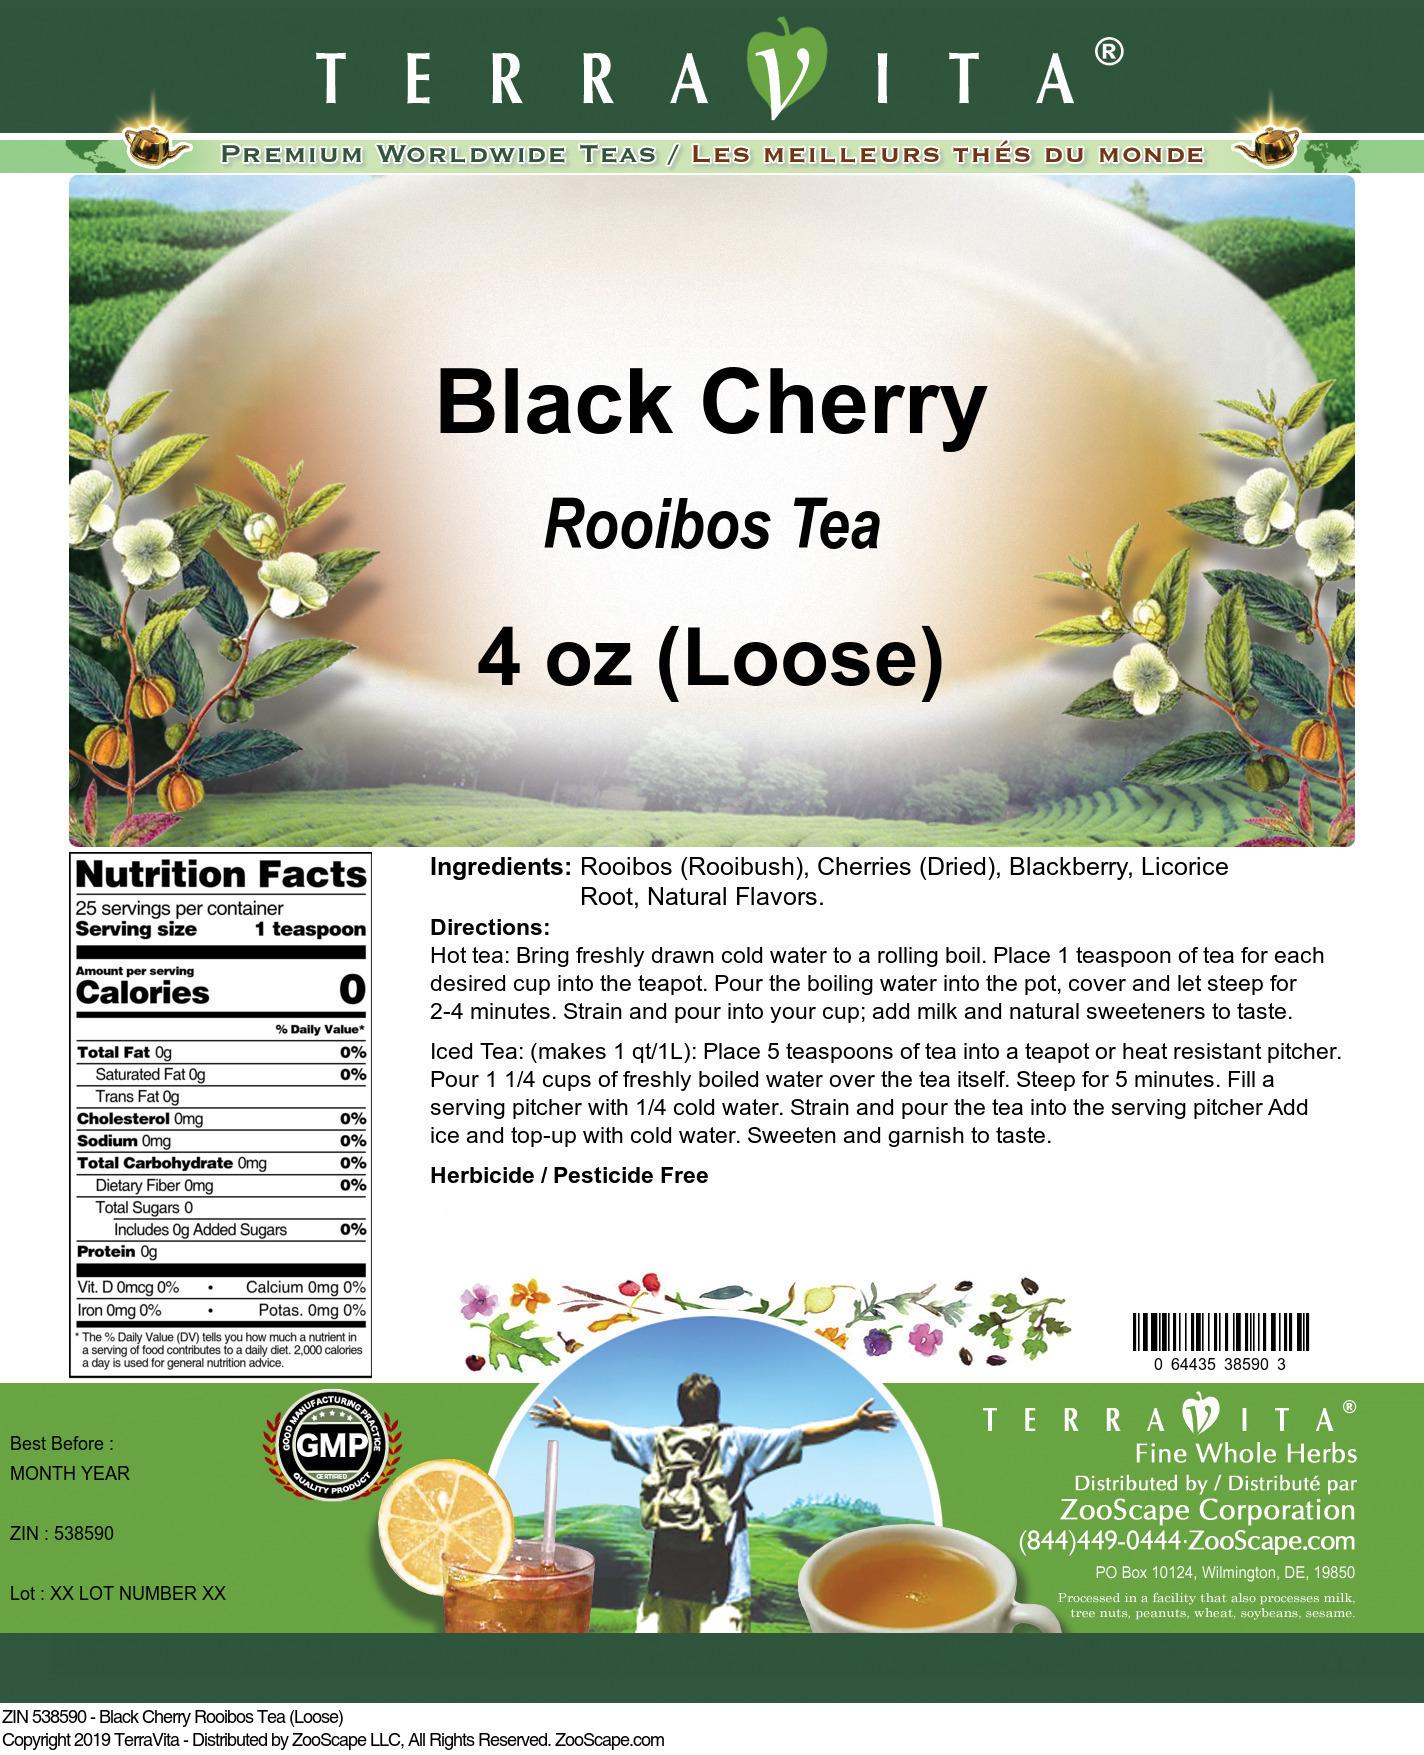 Black Cherry Rooibos Tea